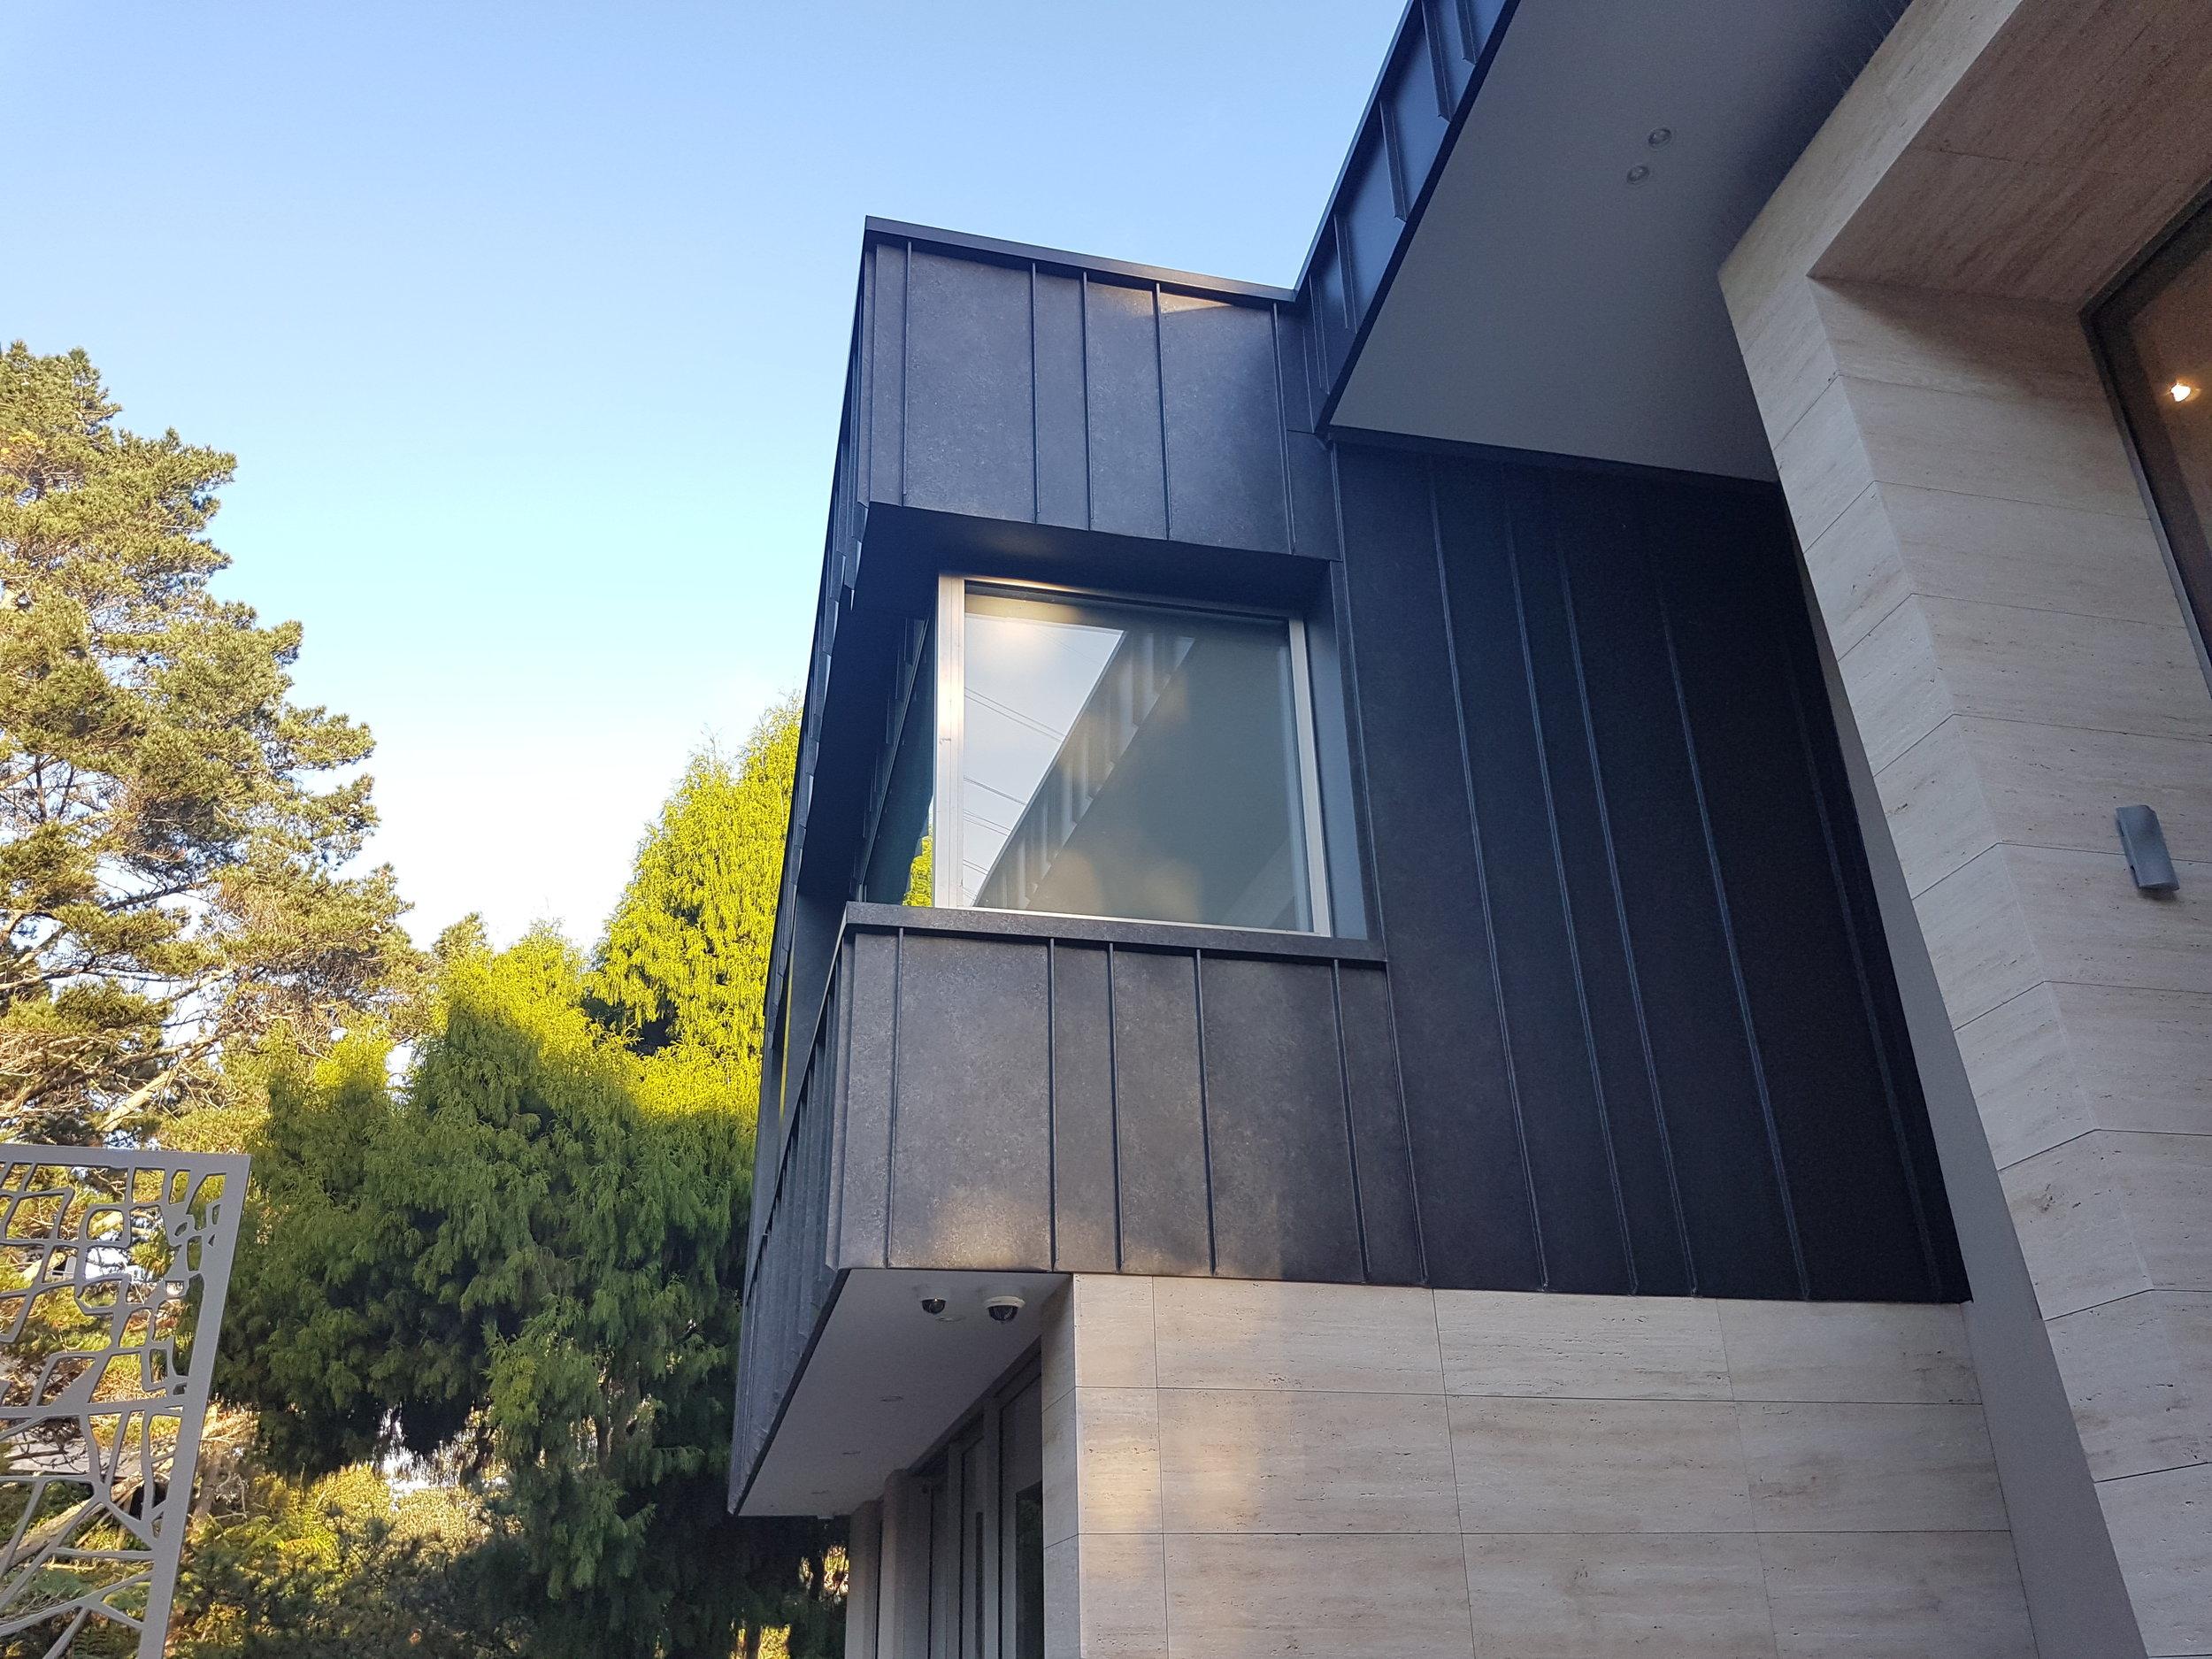 The-Roofing-Store-Steel-Metal-Standing-Seam-Lux-Dark-Corten-7.jpg.jpg